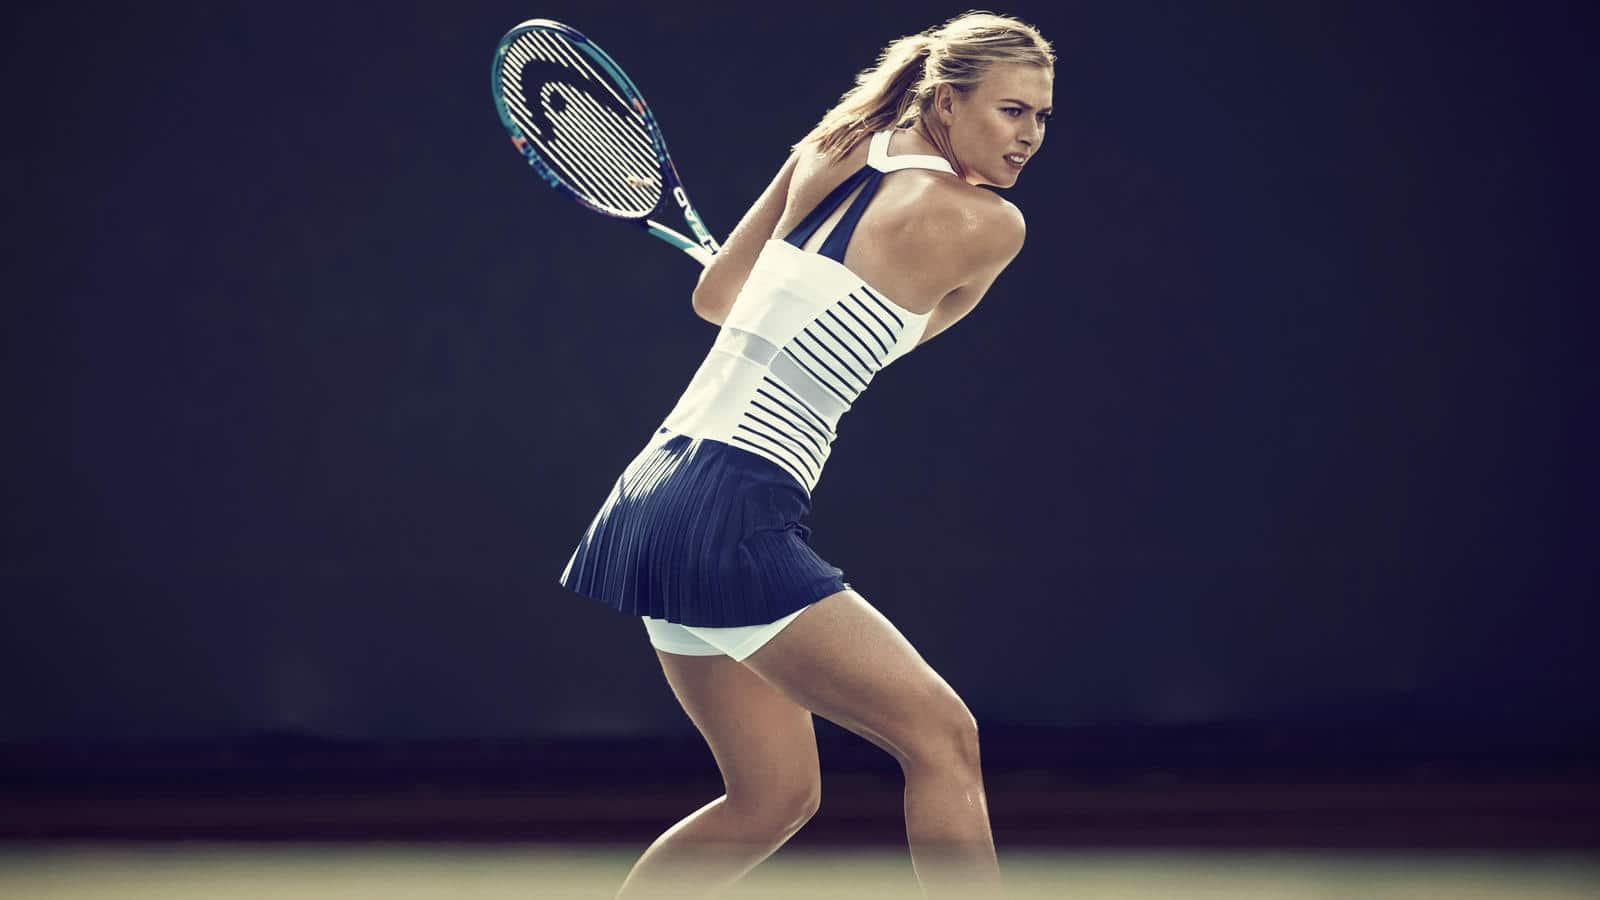 Maria Sharapova Maria Sharapova Hottest Pics Pictures